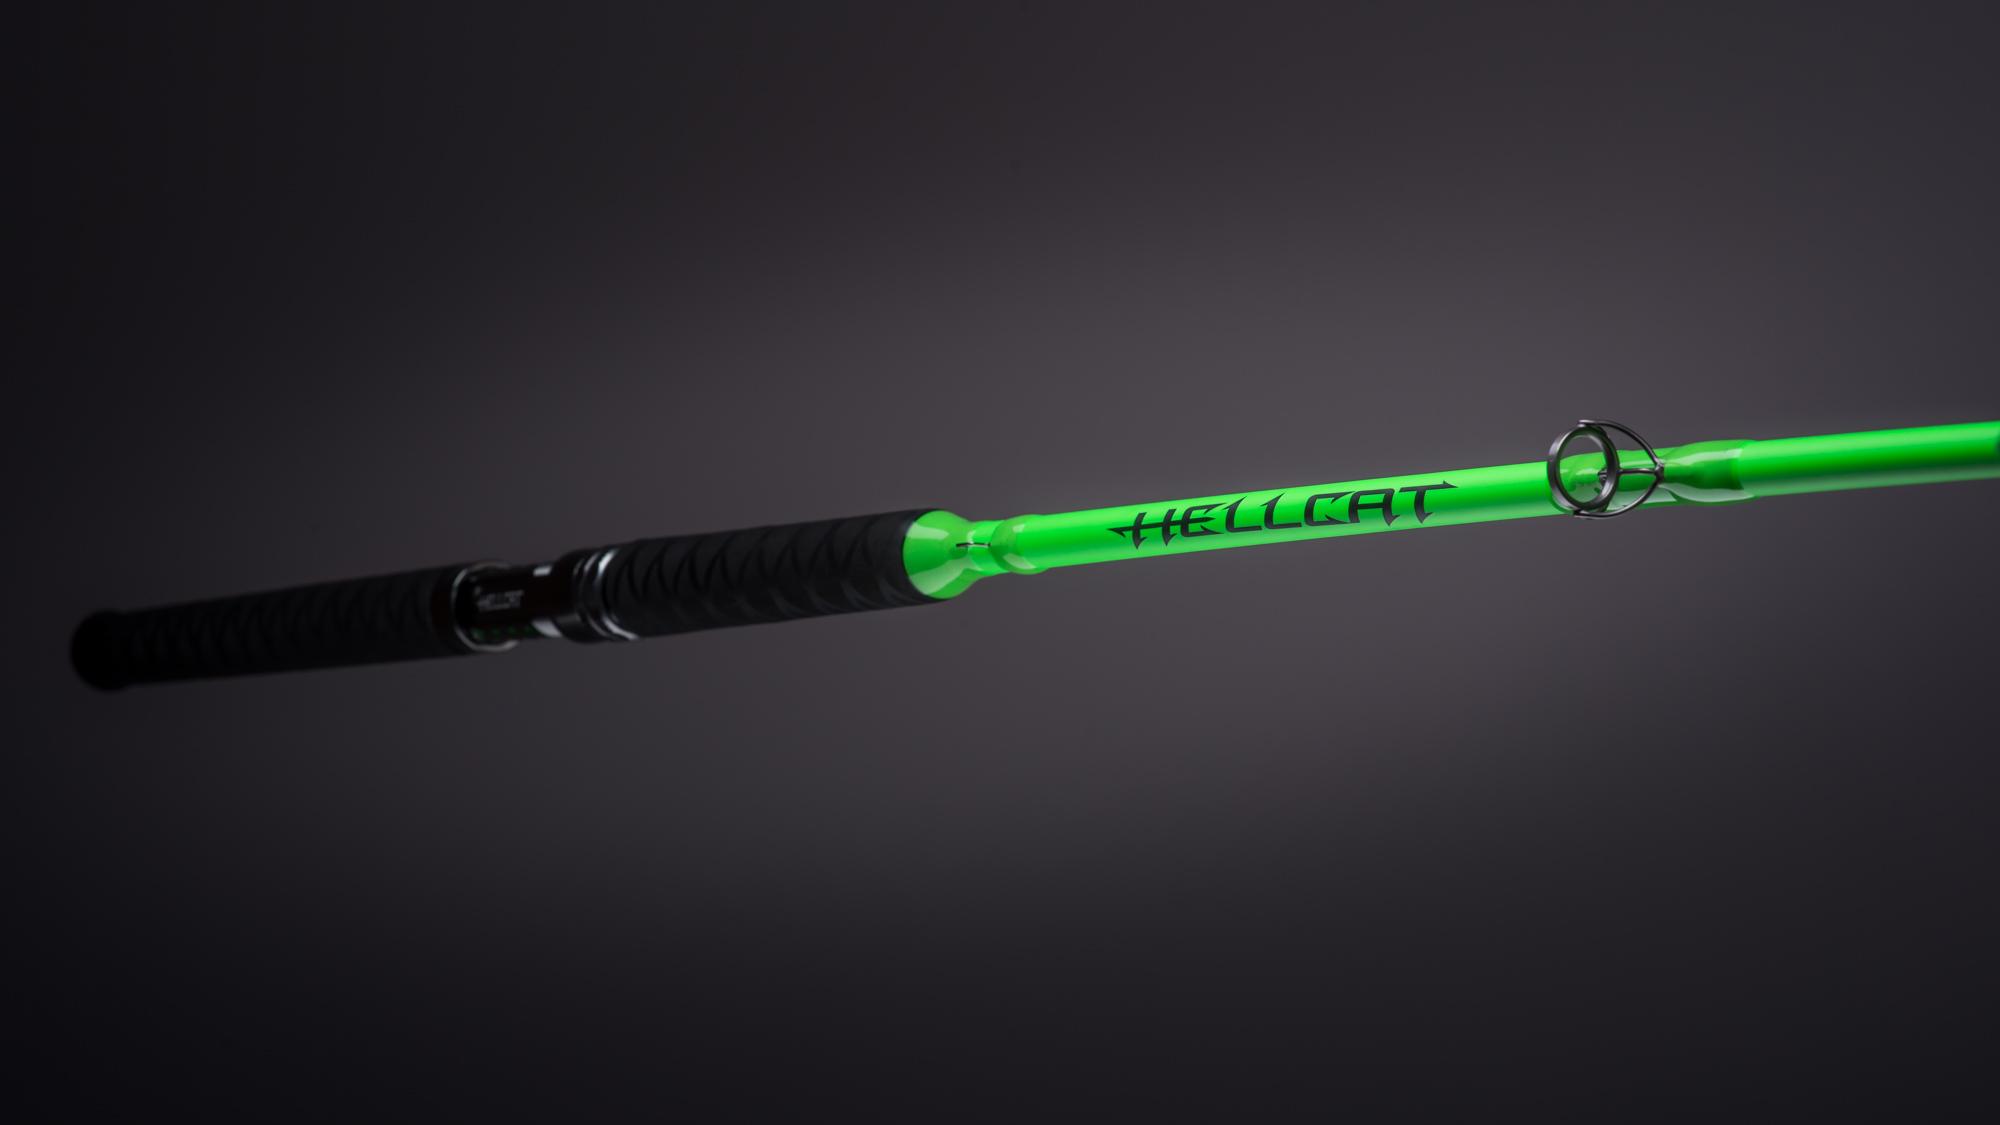 hellcat rod series - catfishing rod by catch the fever Hellcat Rod Series – Catfishing Rod by Catch The Fever w5s8NebrLFYRf5vFZH41Hz o